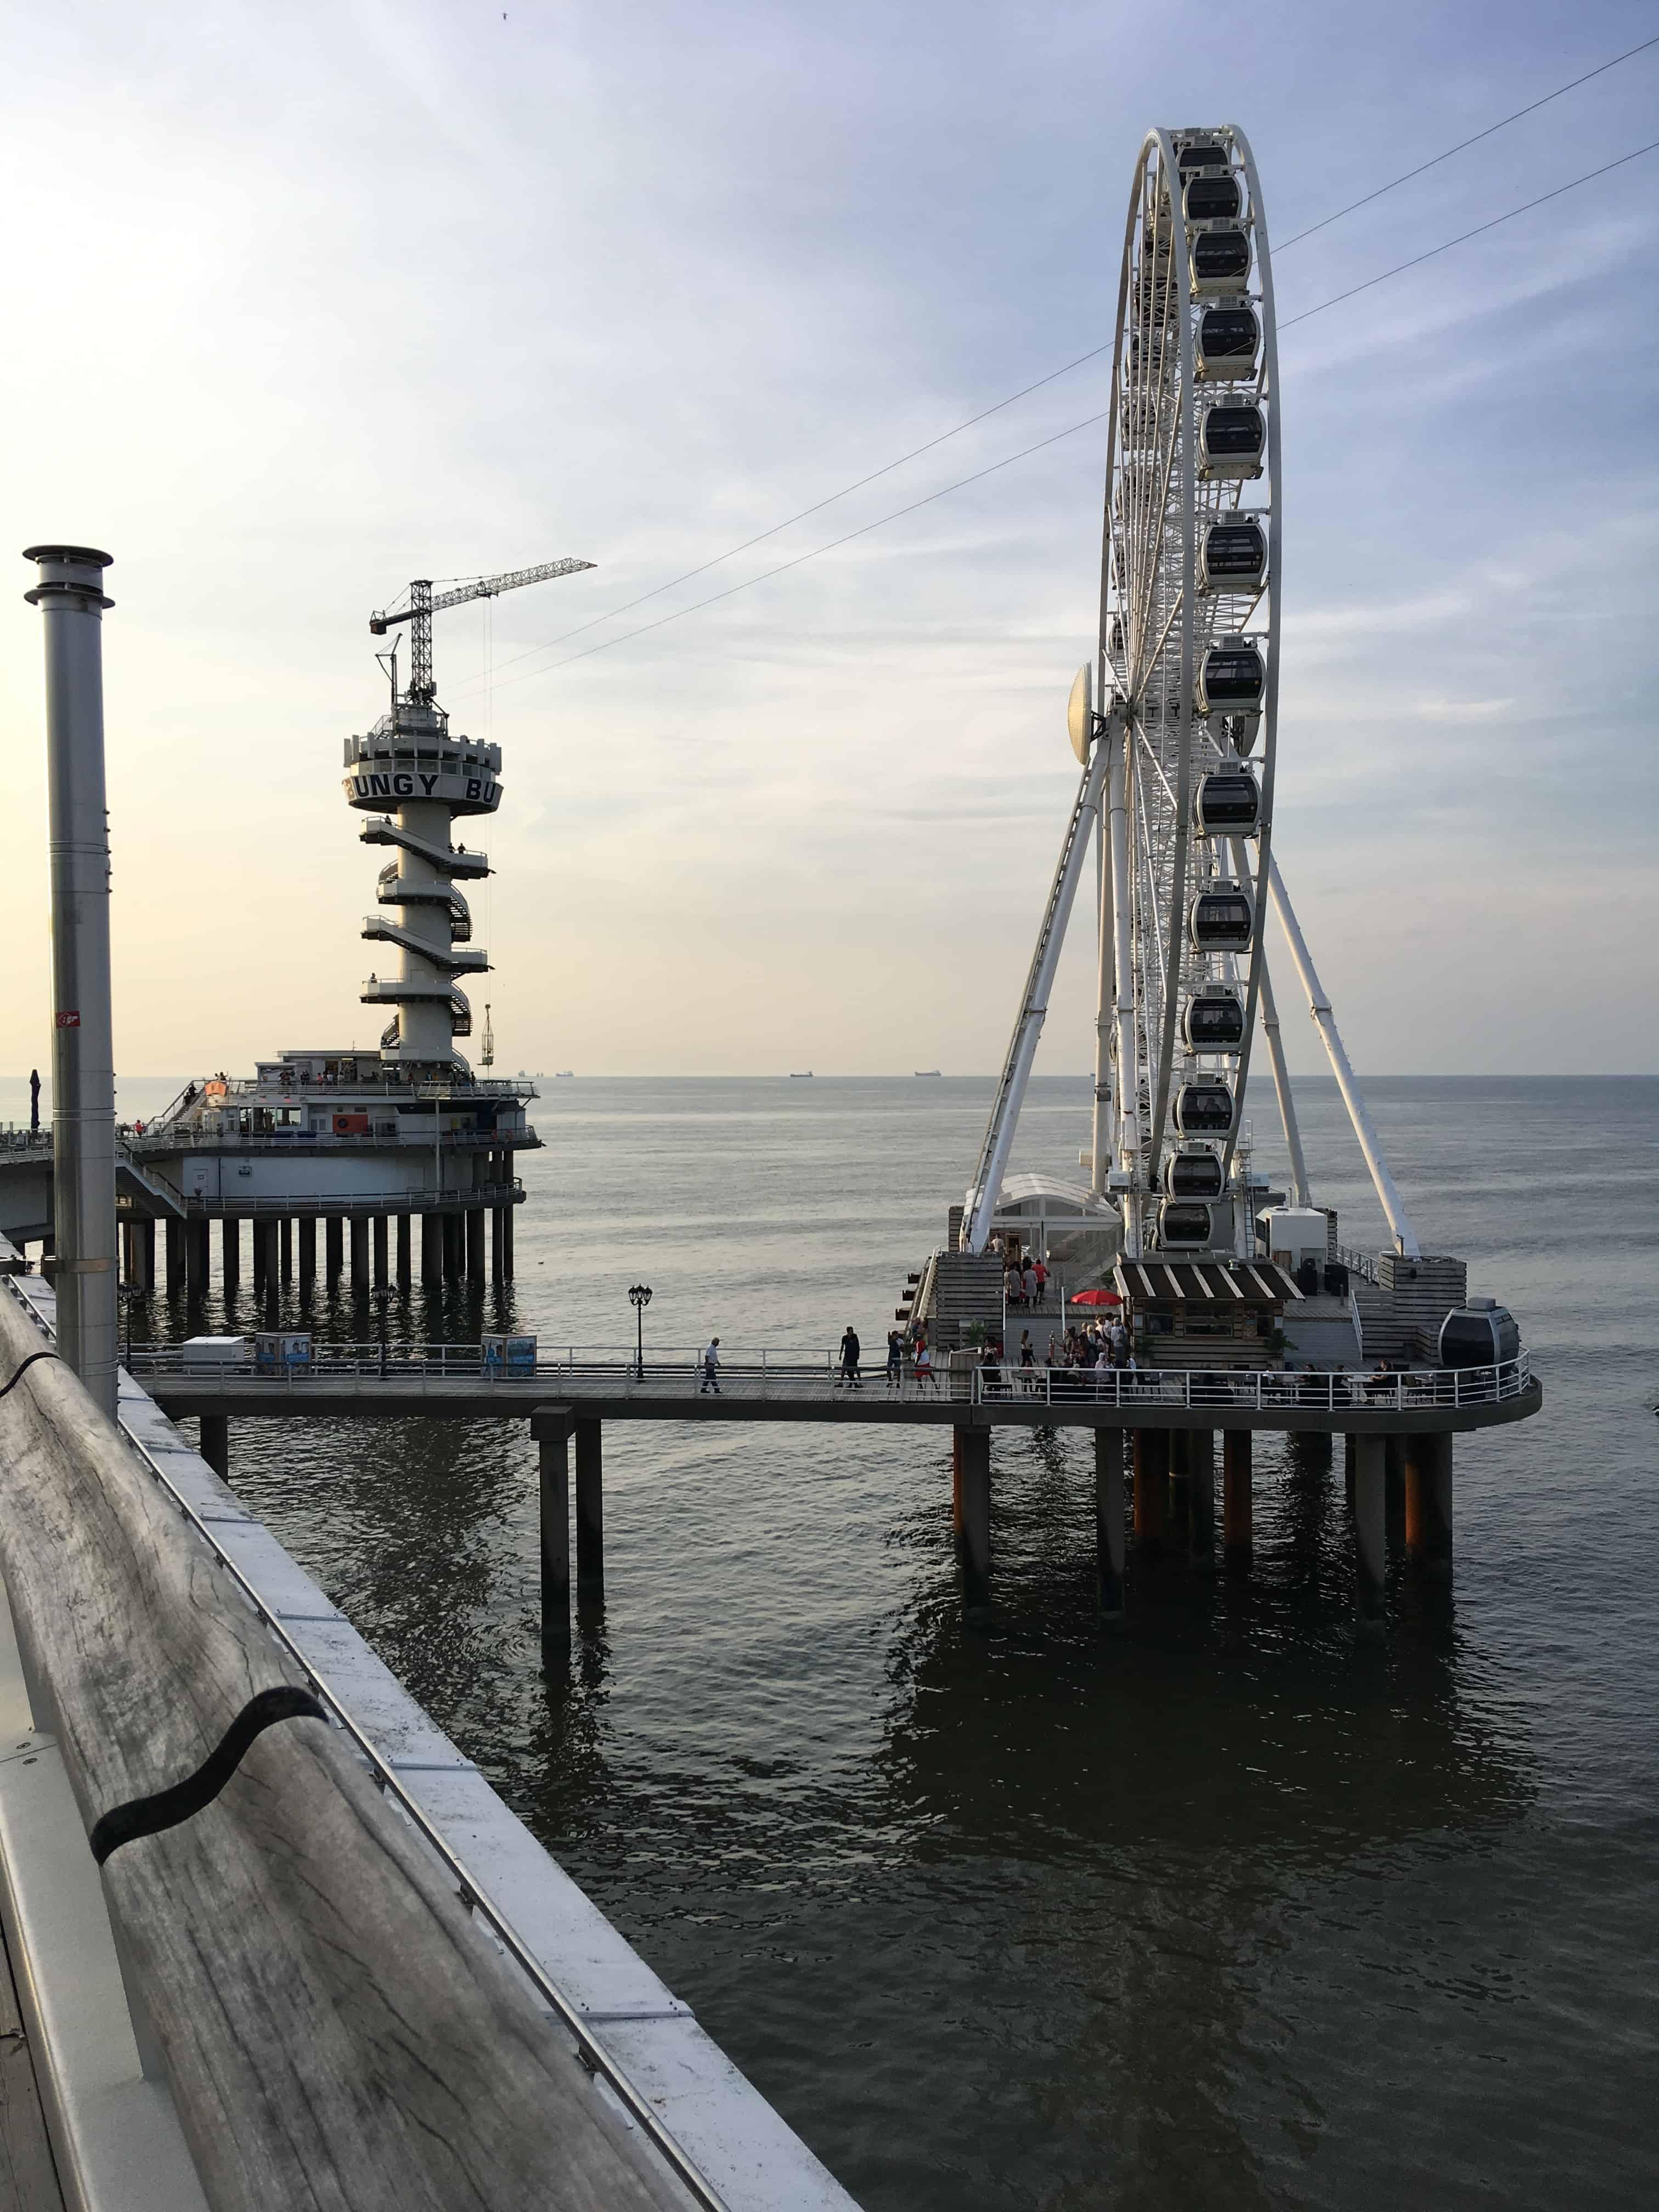 Pariserhjul og Bungy jump tårn - set fra The Pier